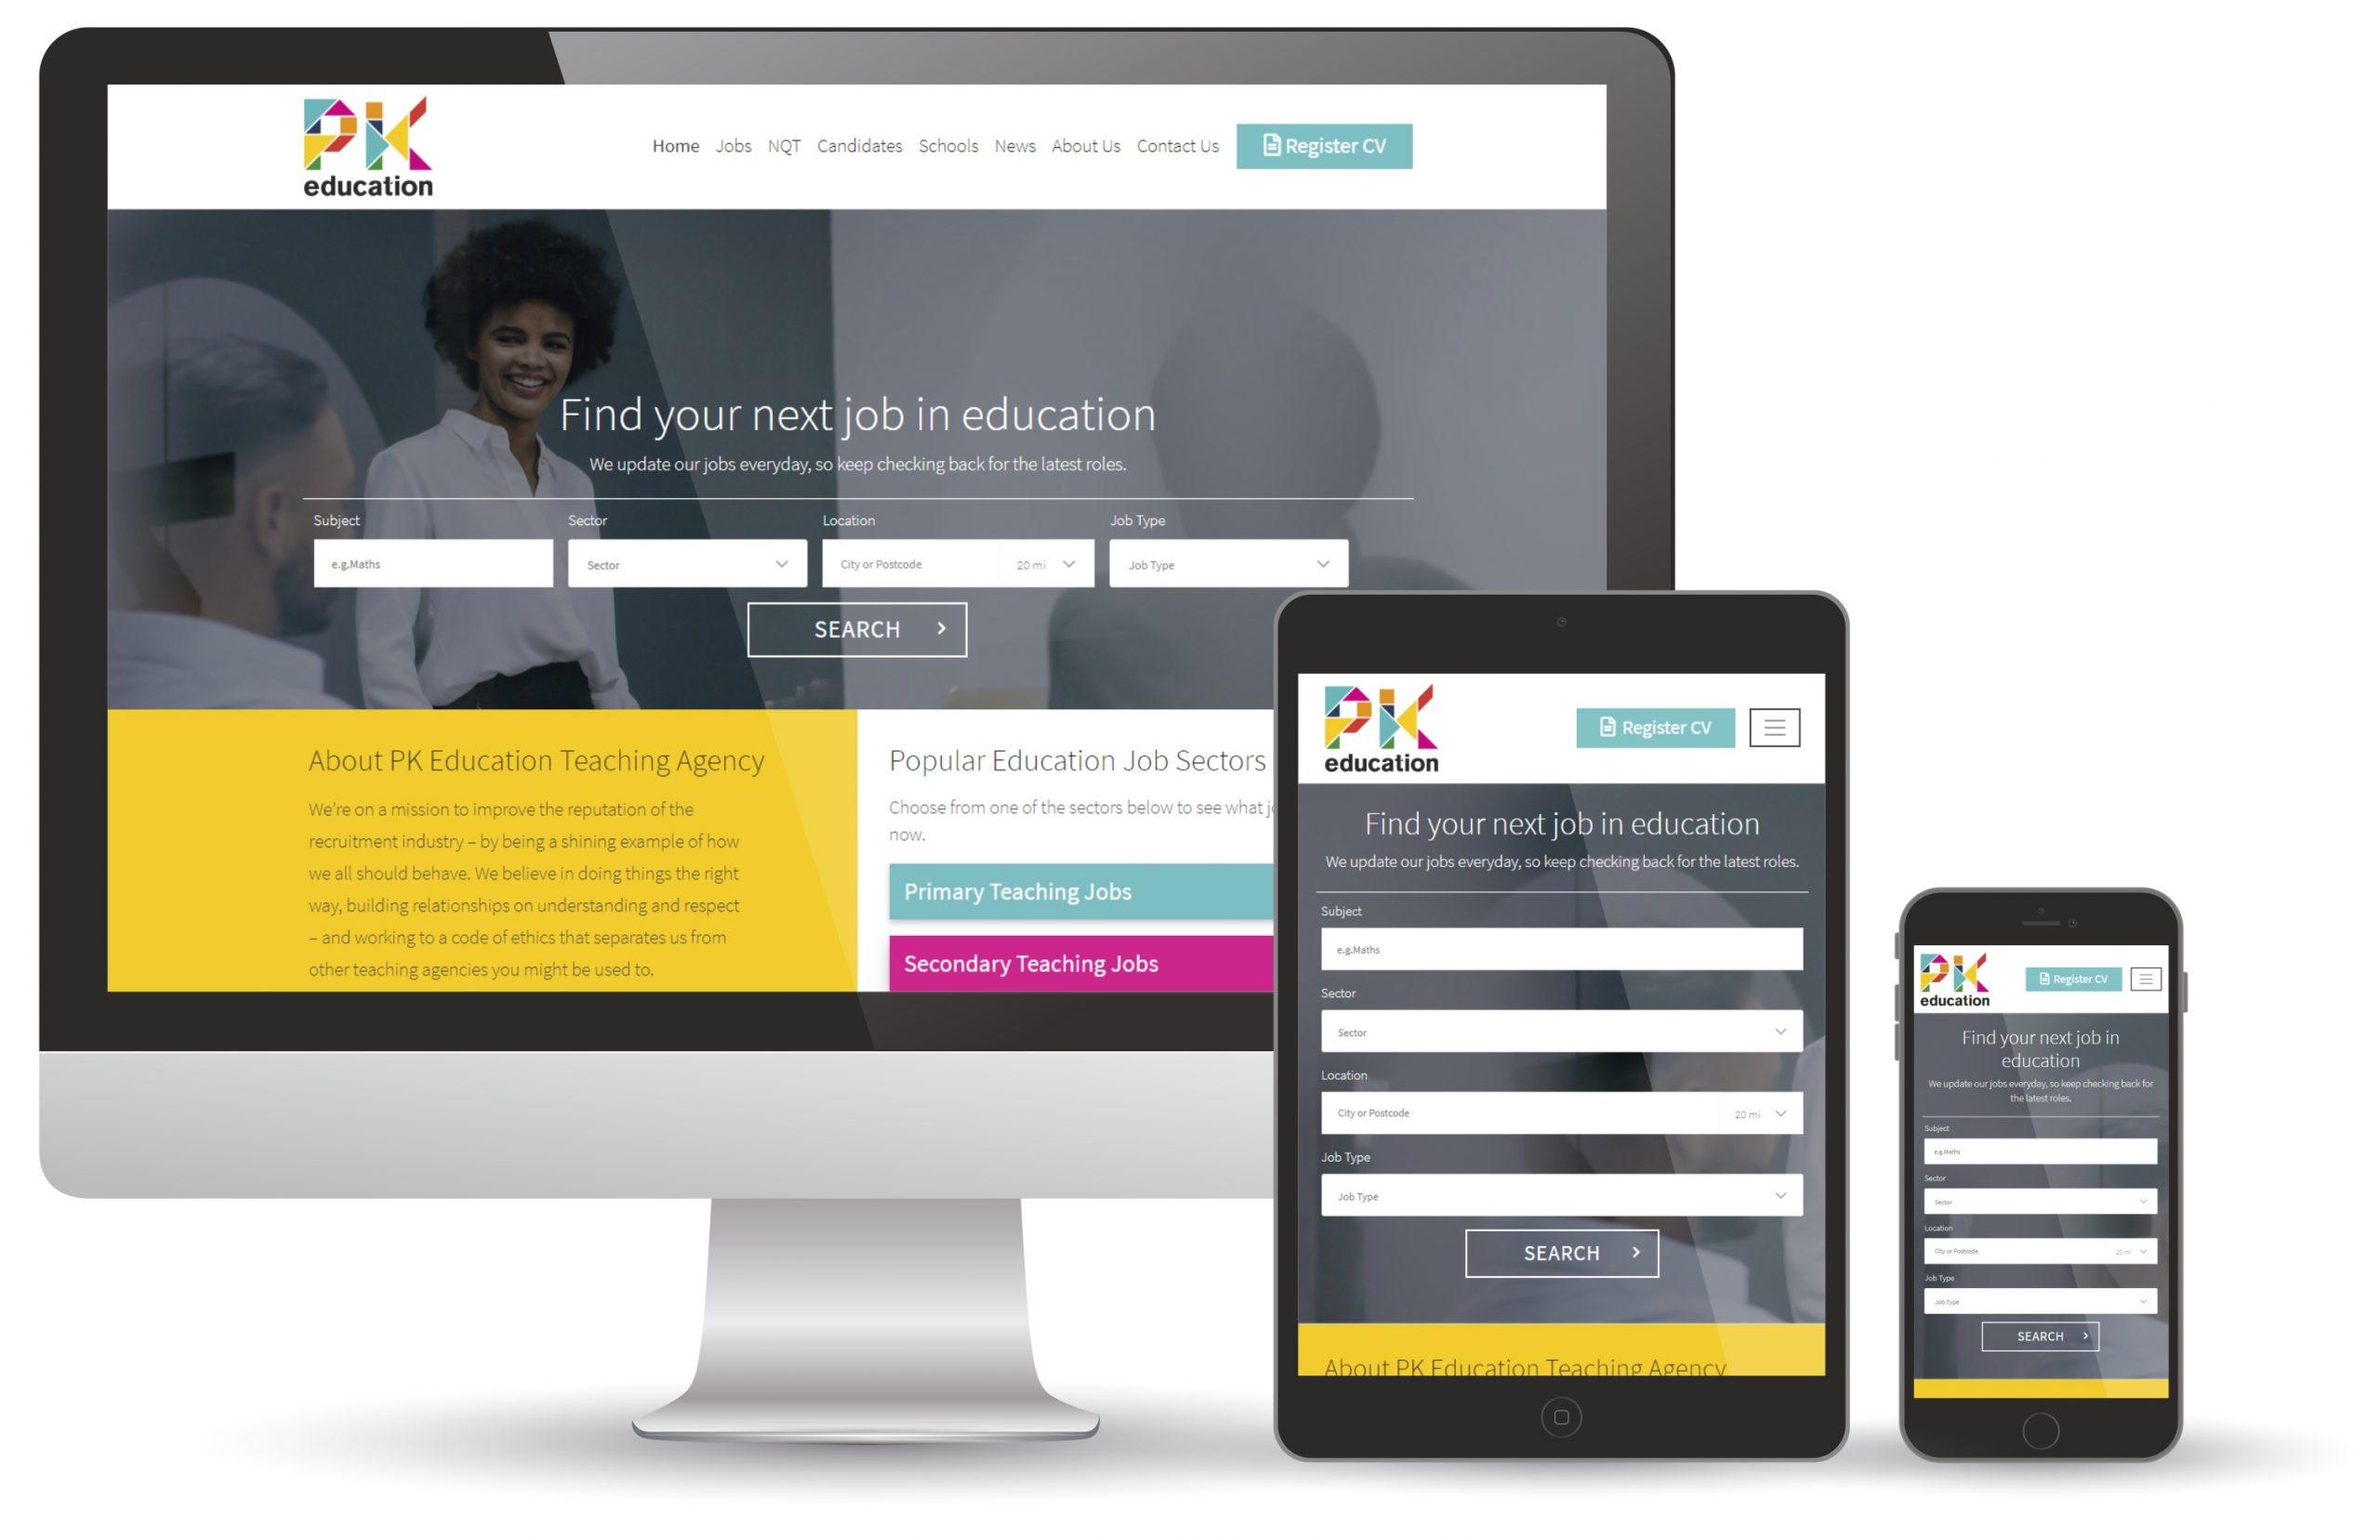 PK Education